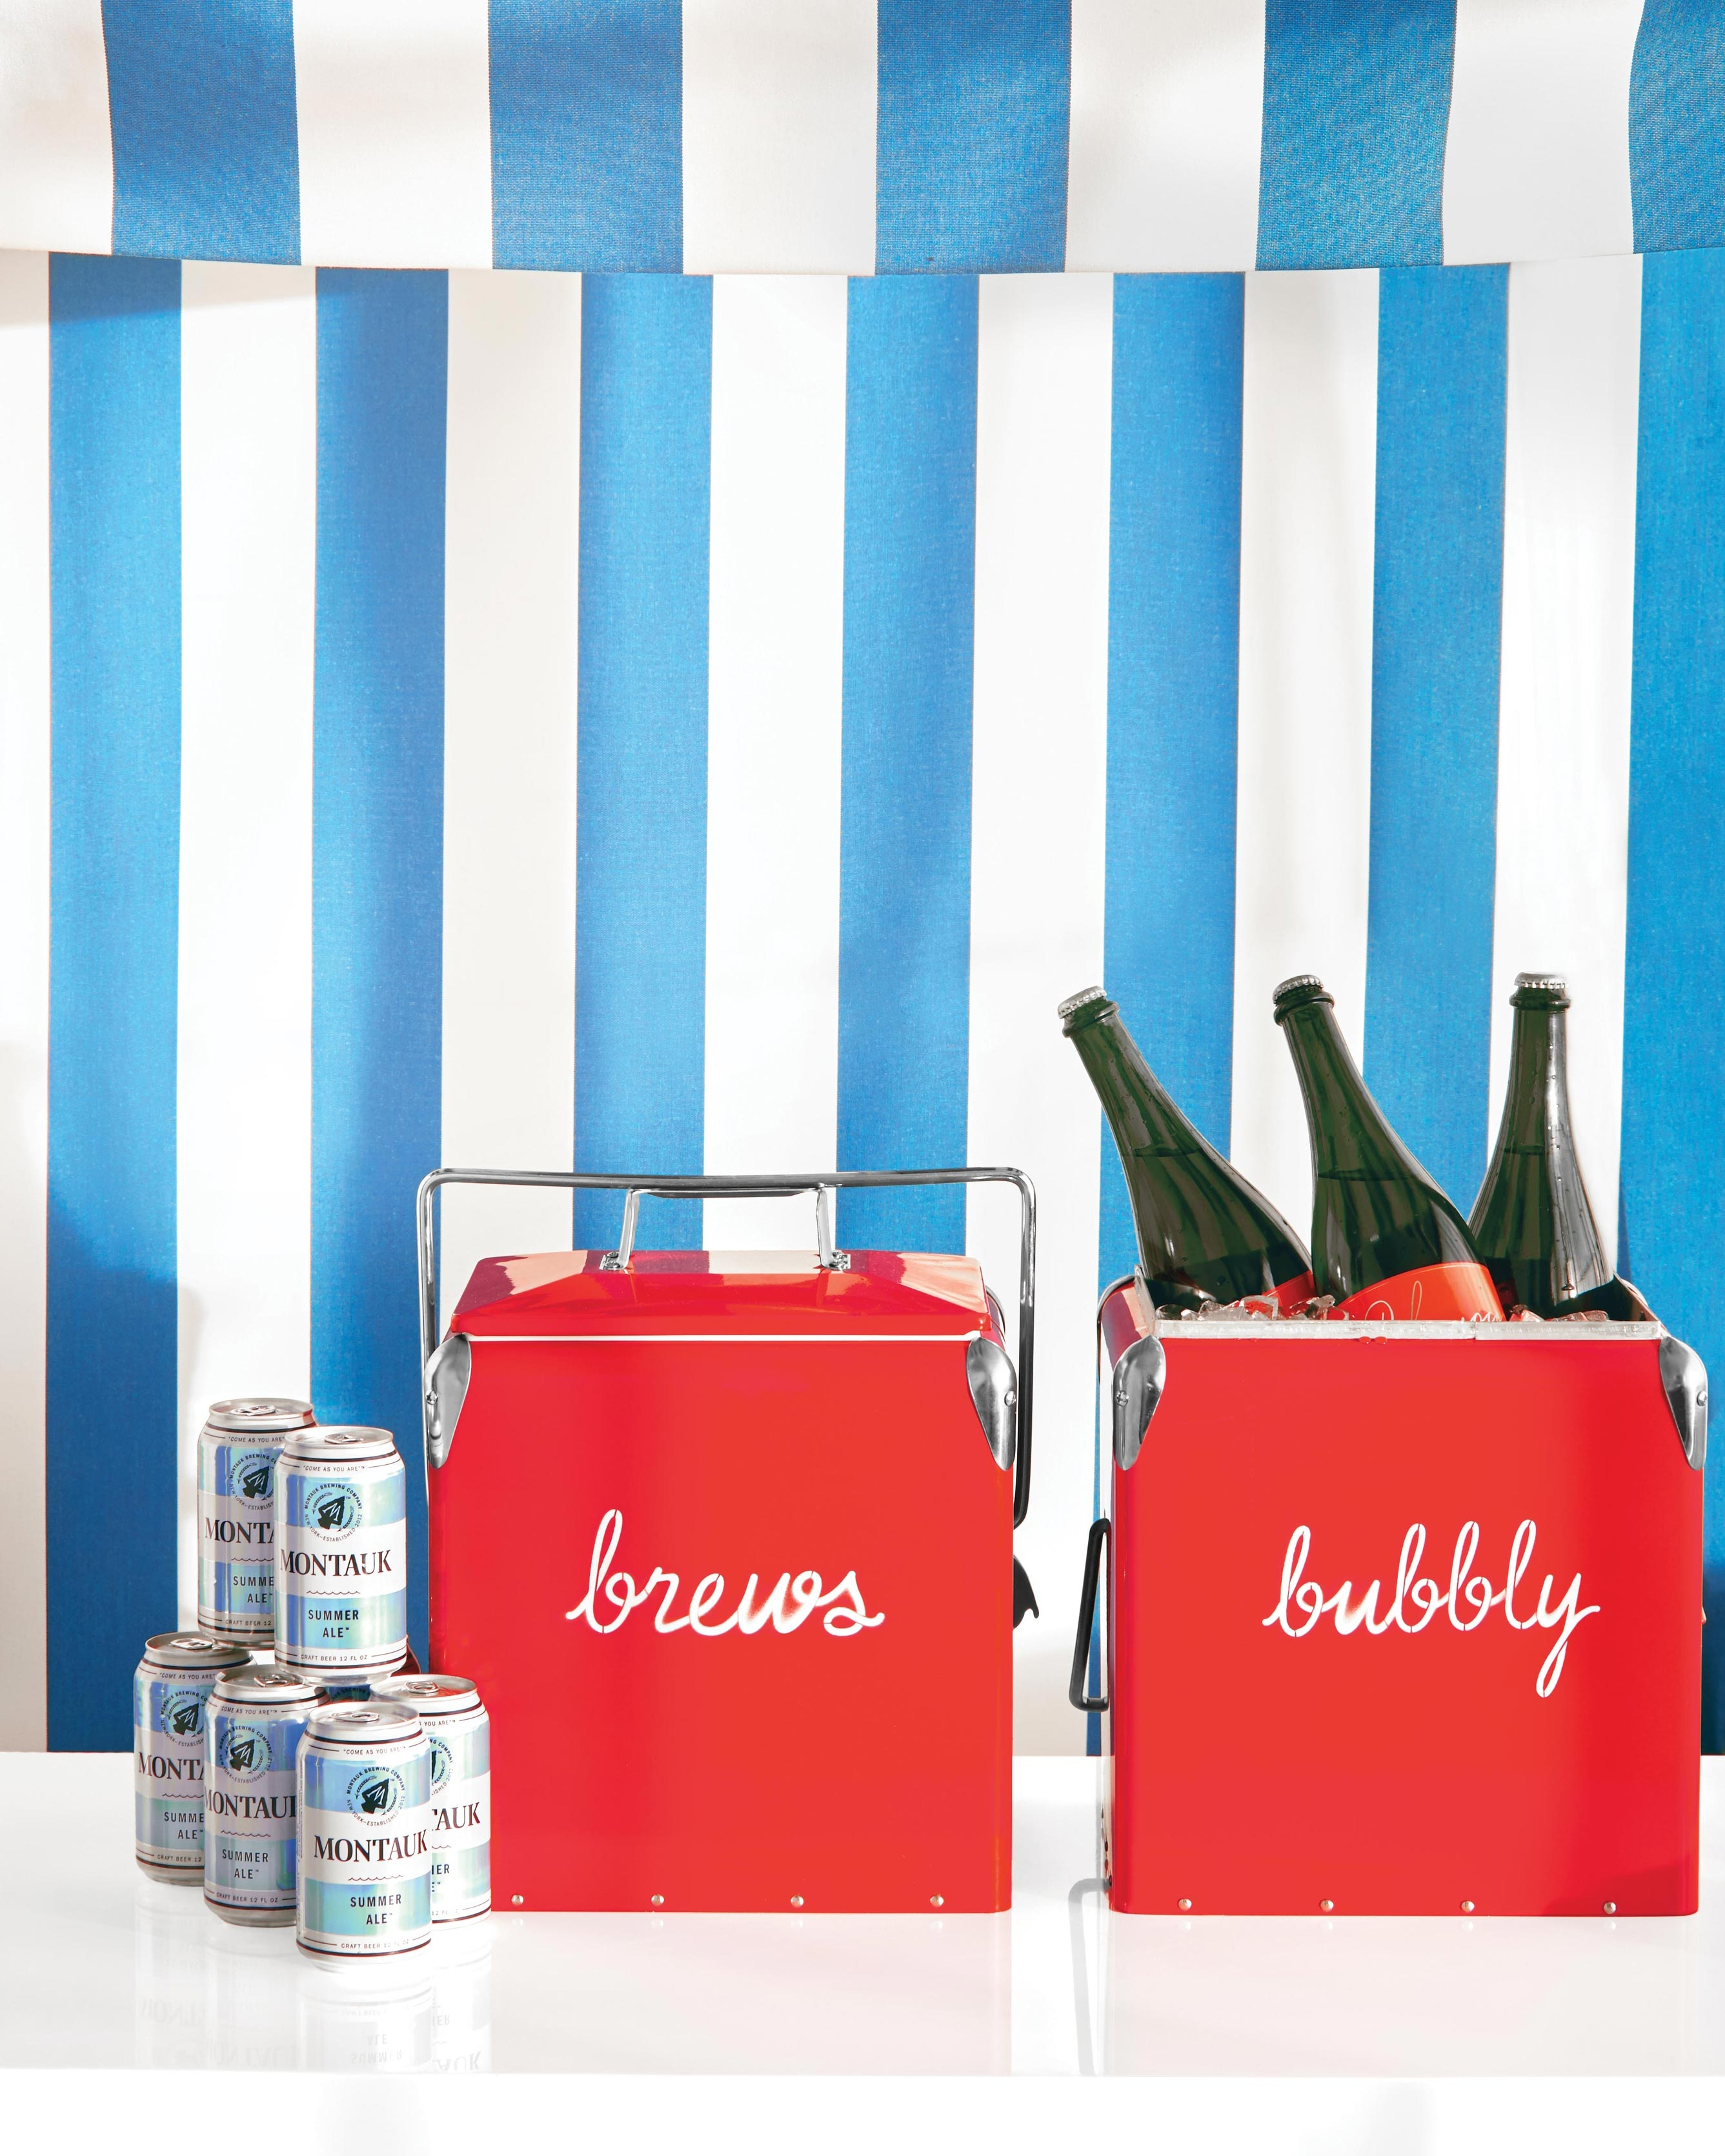 blue-red-wedding-colors-opener-cooler-drinks-823-d112667-comp.jpg